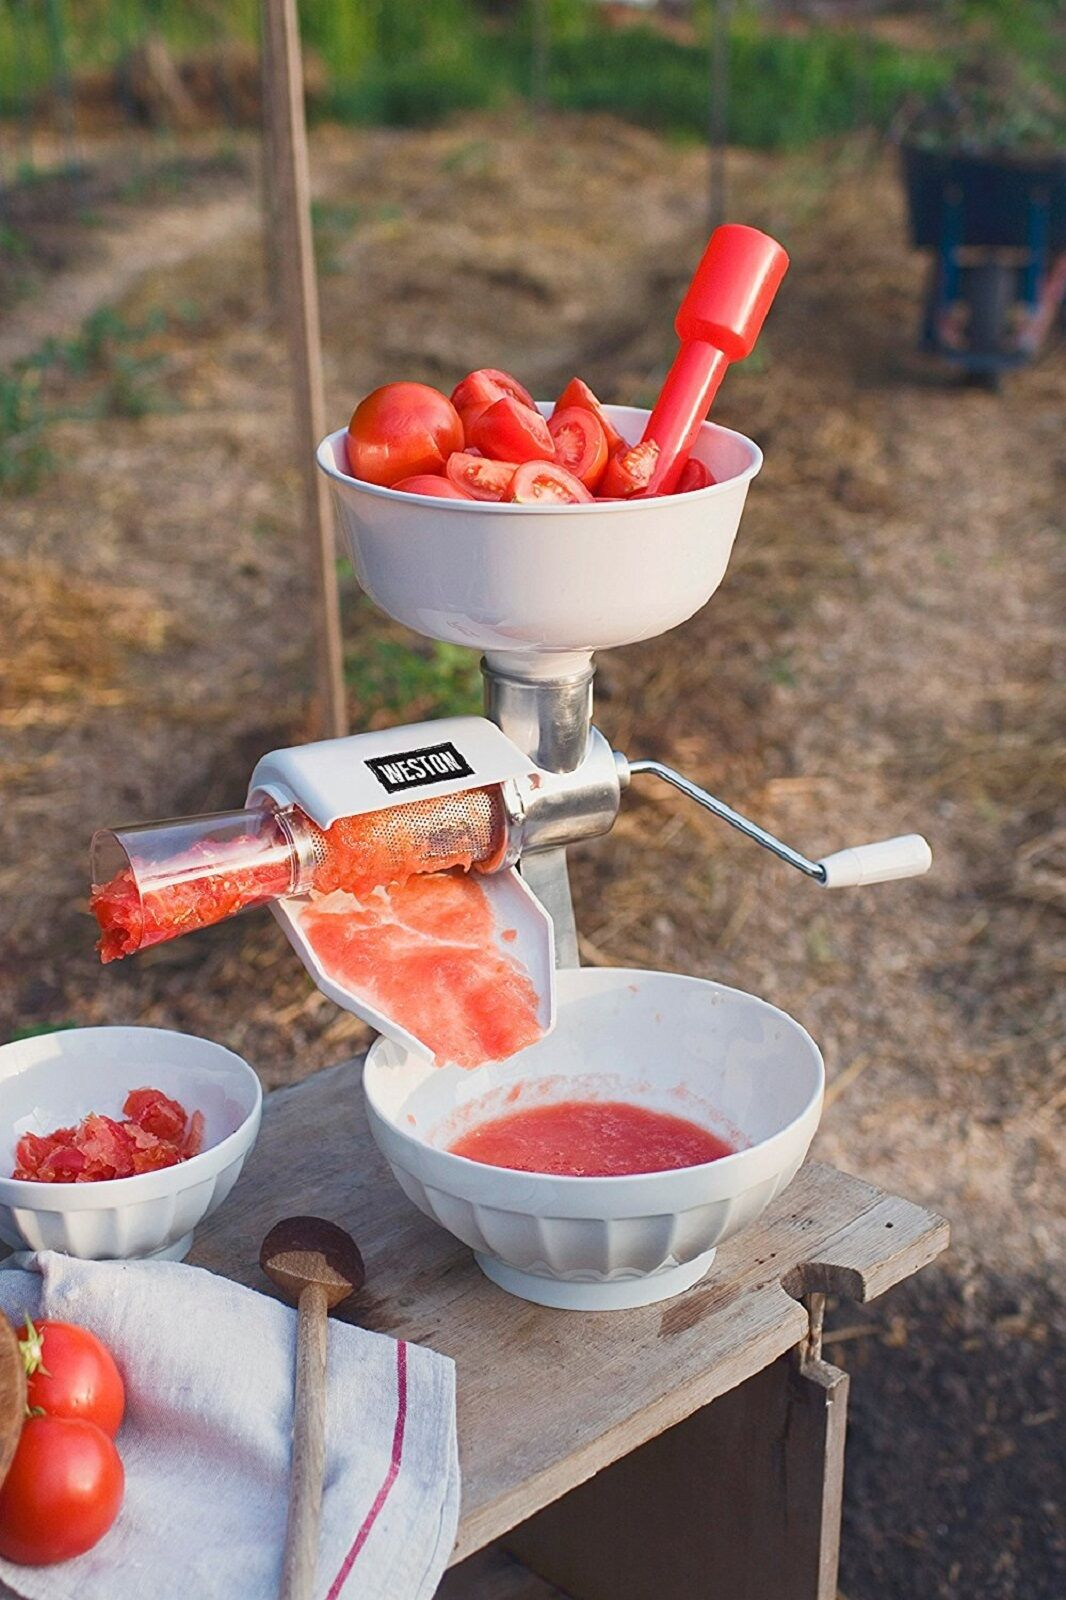 Tomato Sauce Maker Food Strainer Electric Motor Apple Puree